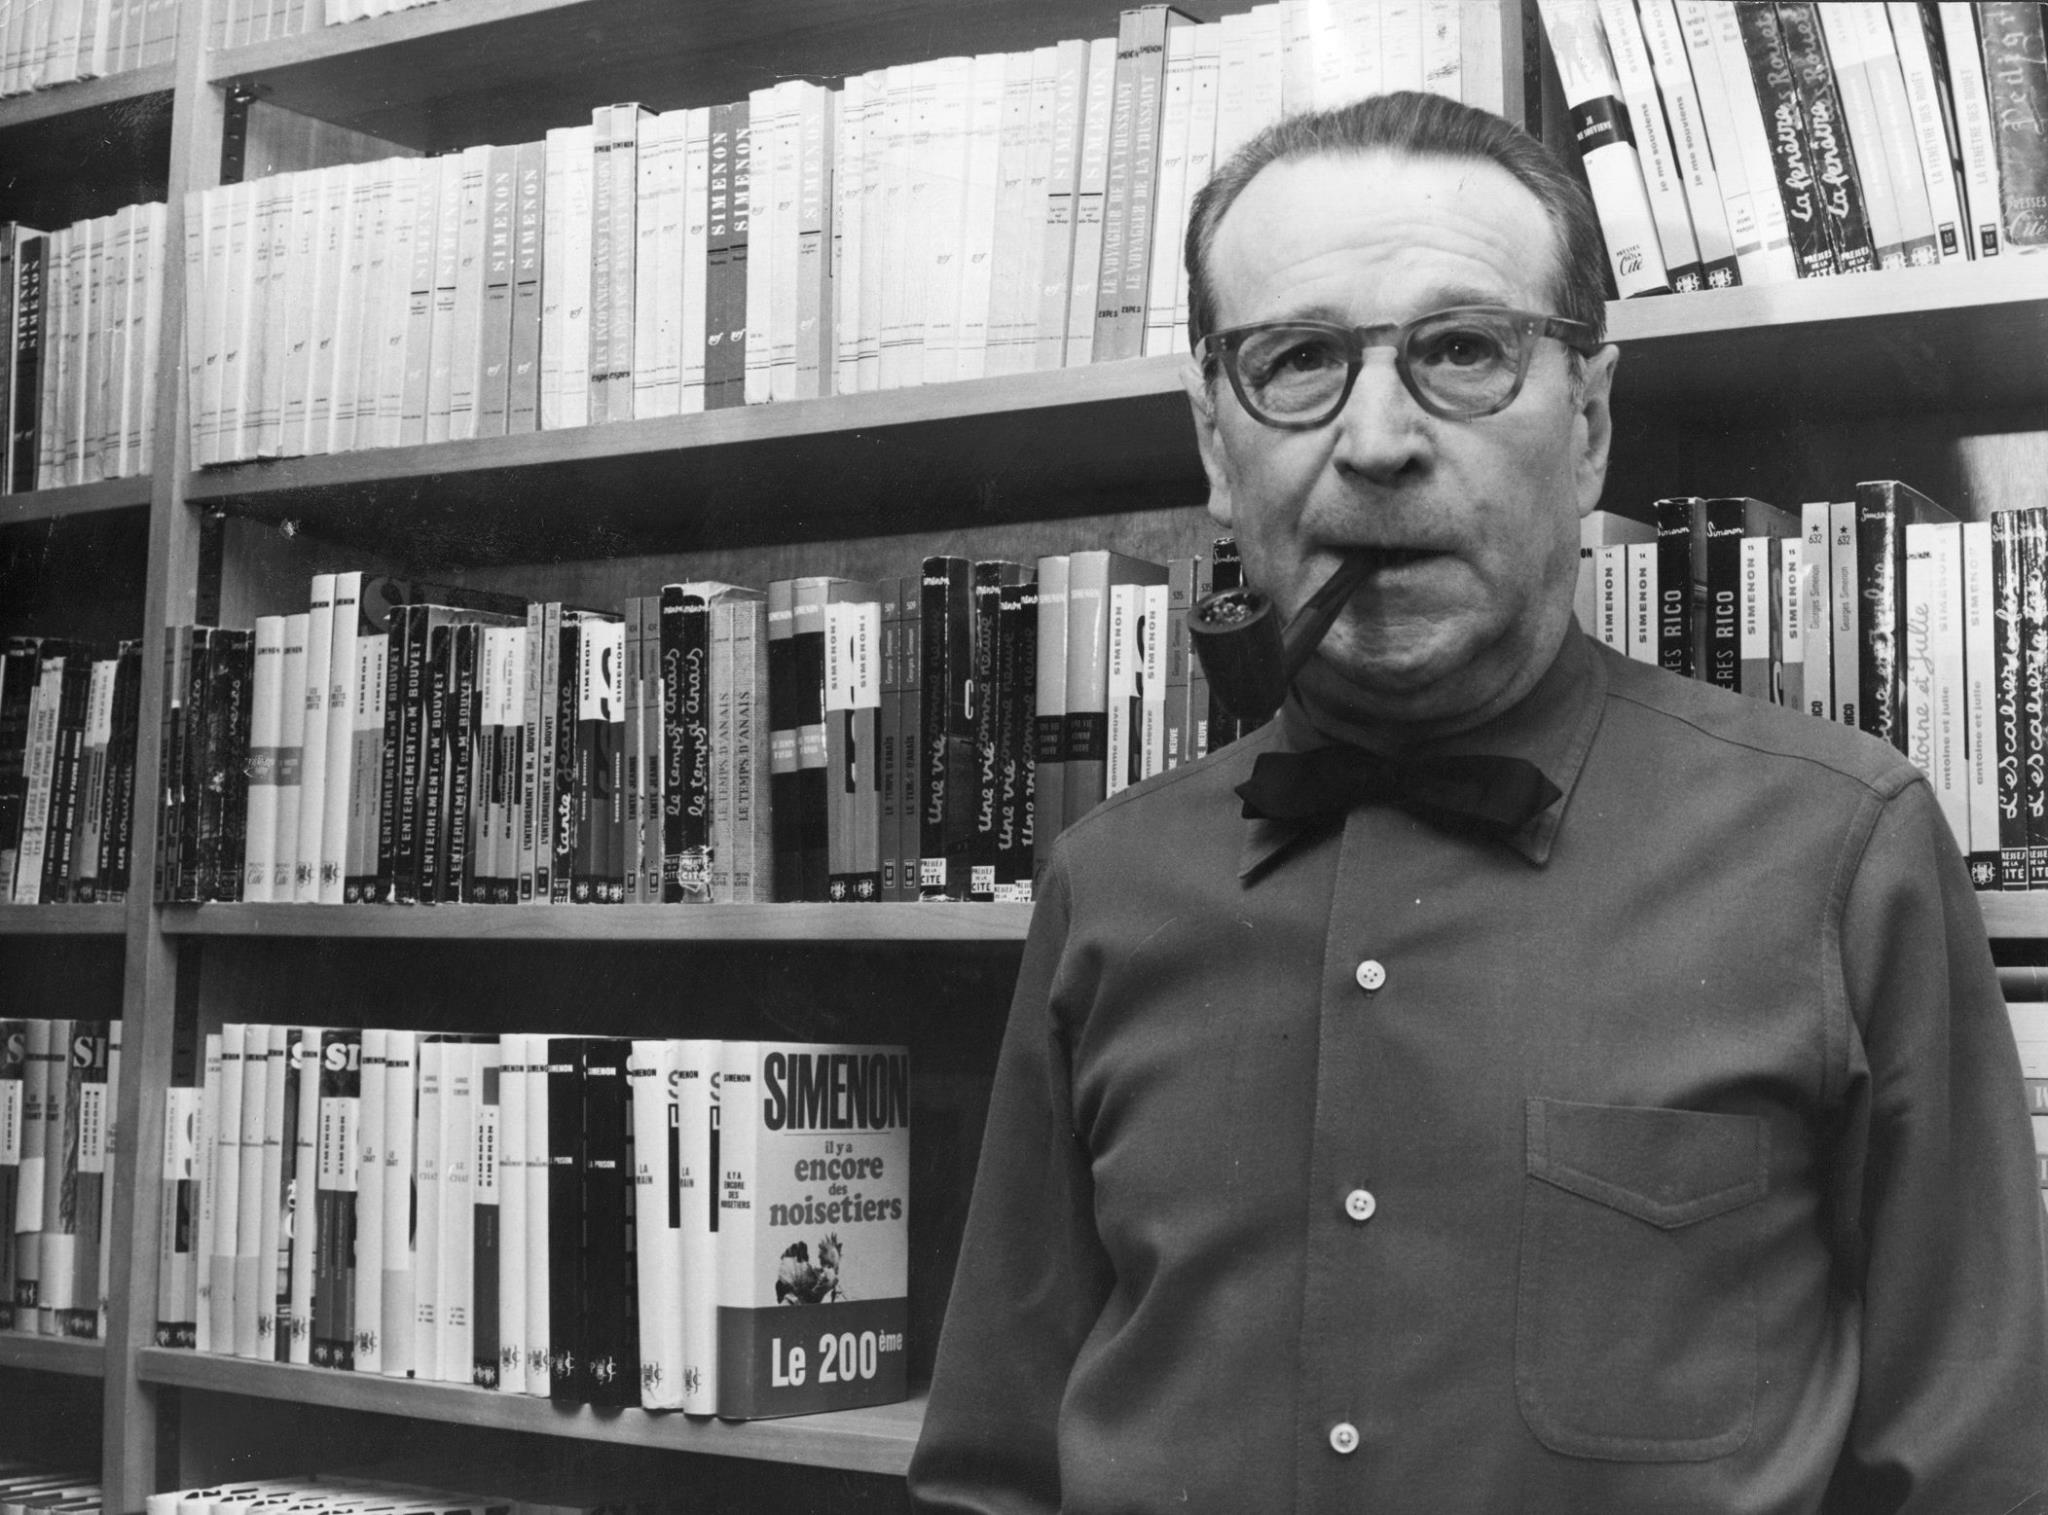 Chi era Georges Simenon